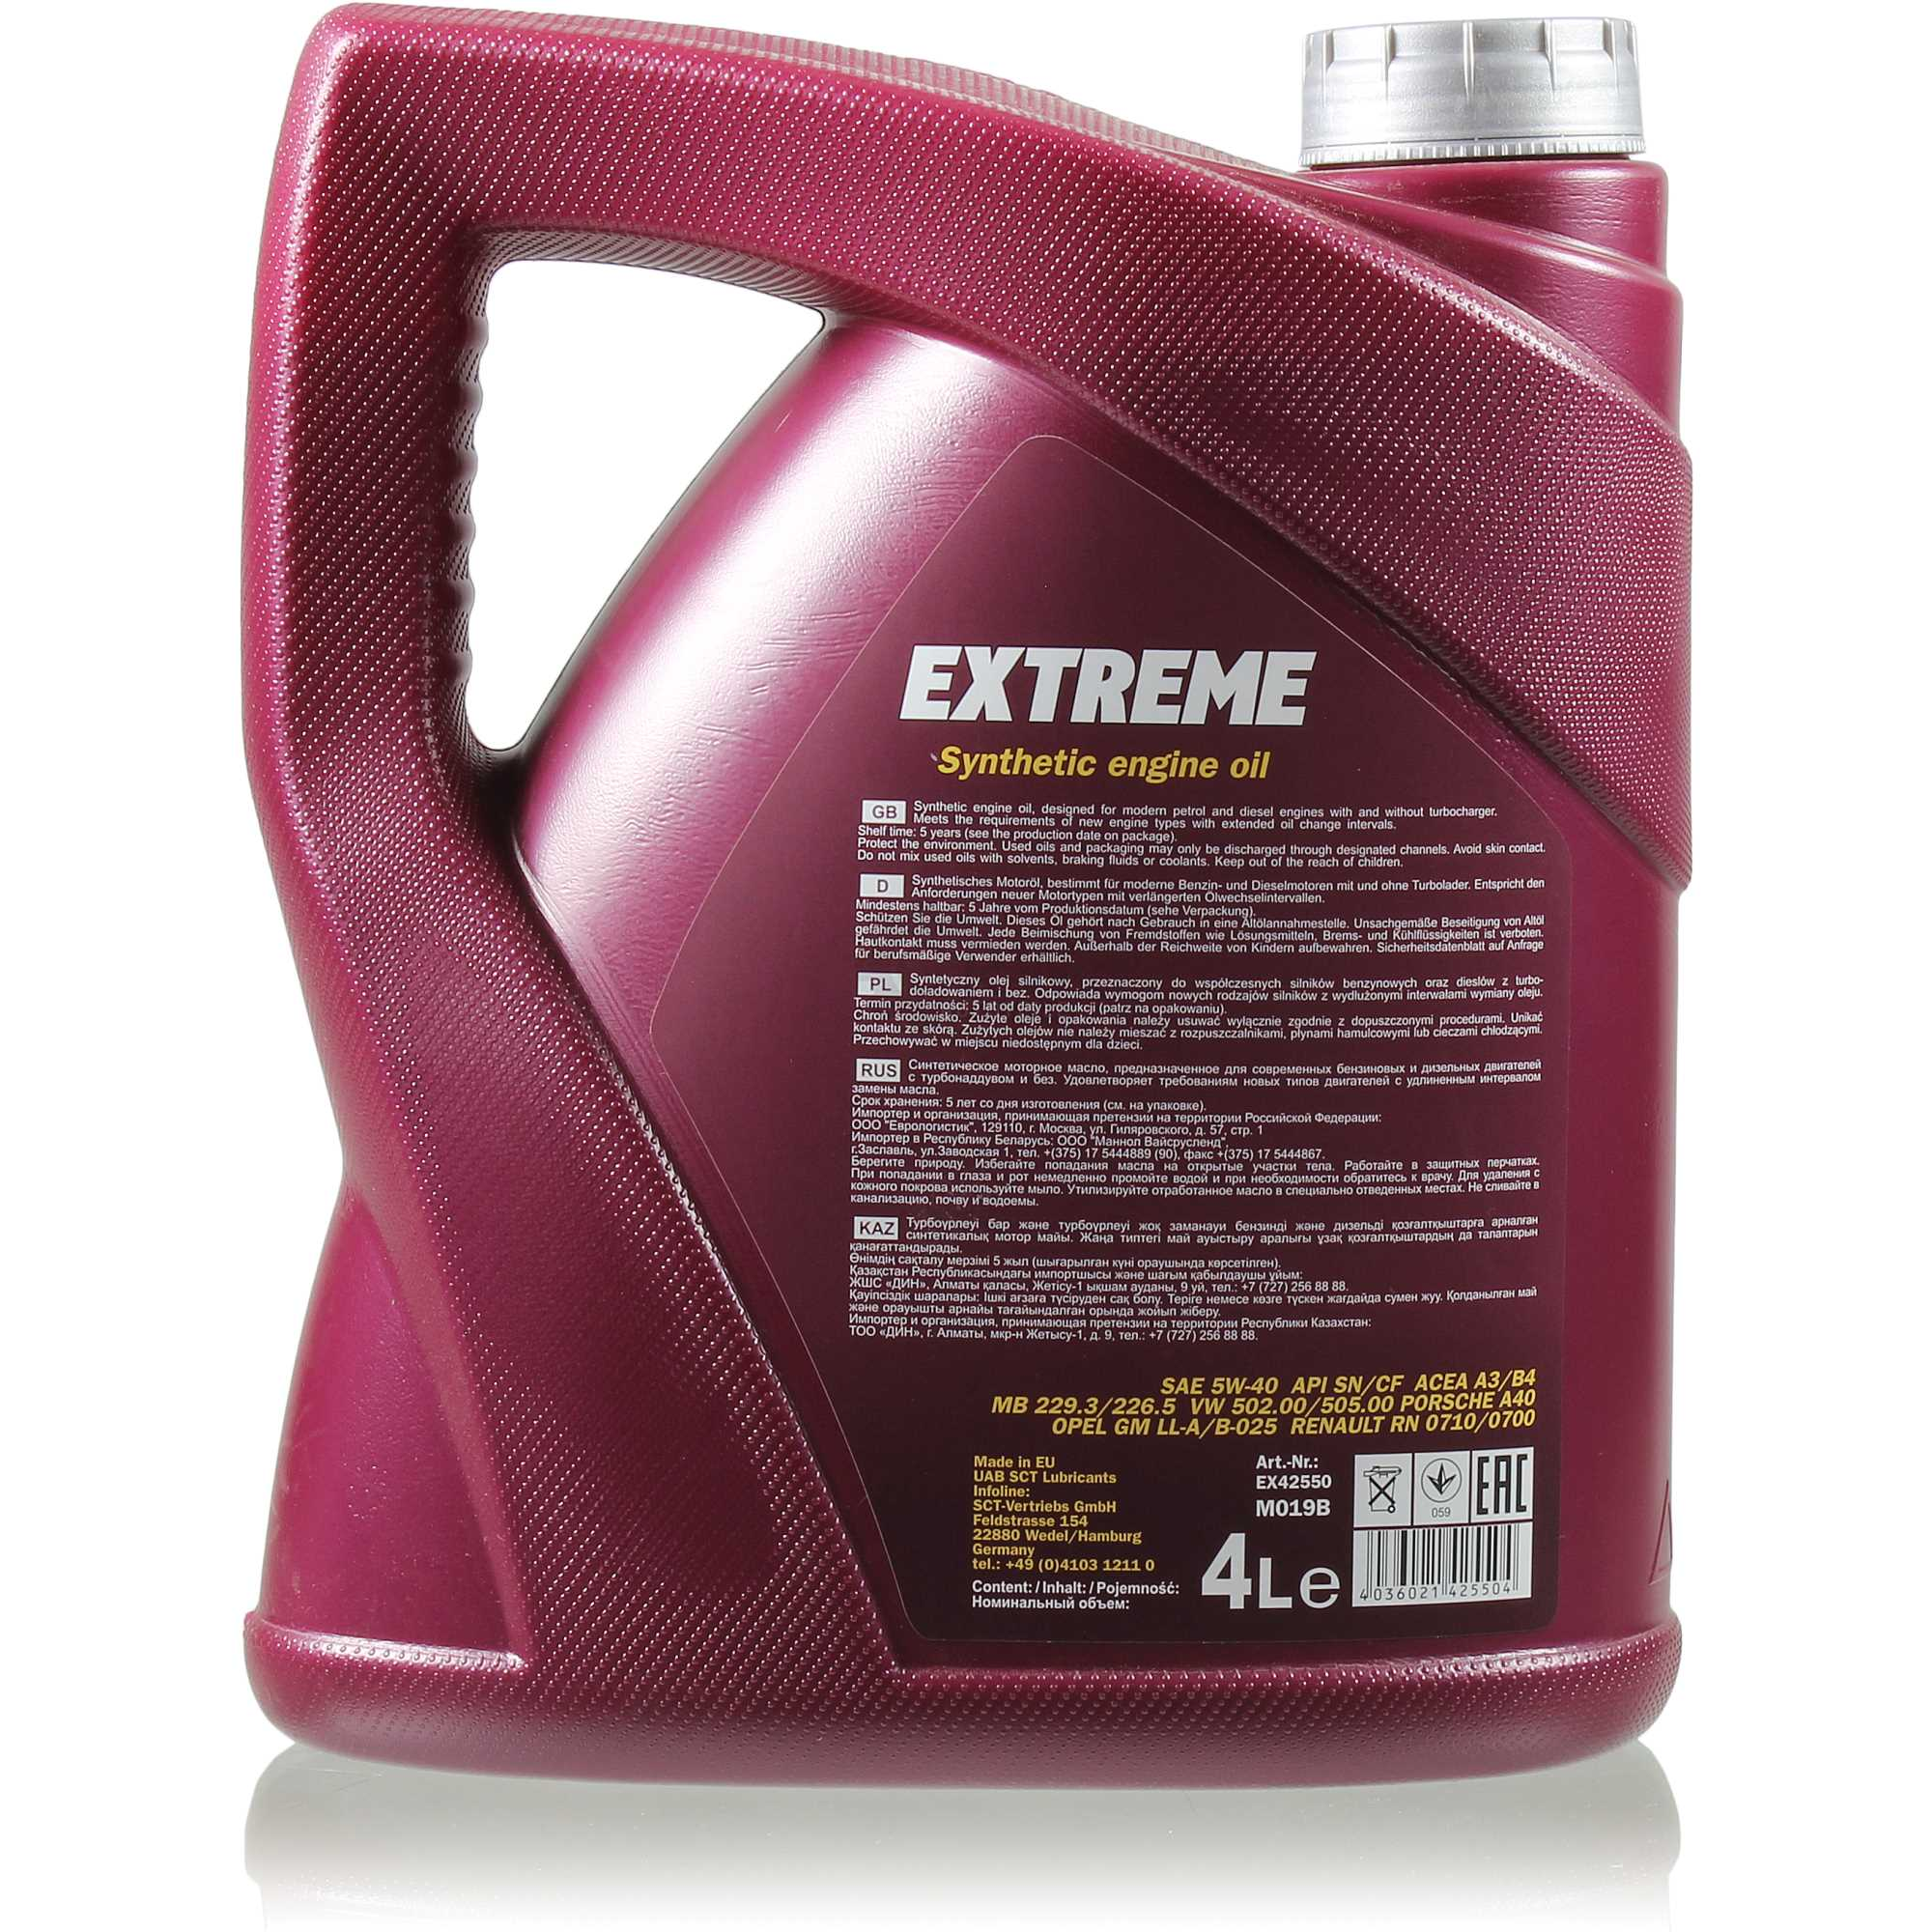 Aceite-del-motor-aceite-5w40-10w40-15w40-5w30-10w60-1l-4l-5l-7l-10l-20l miniatura 55